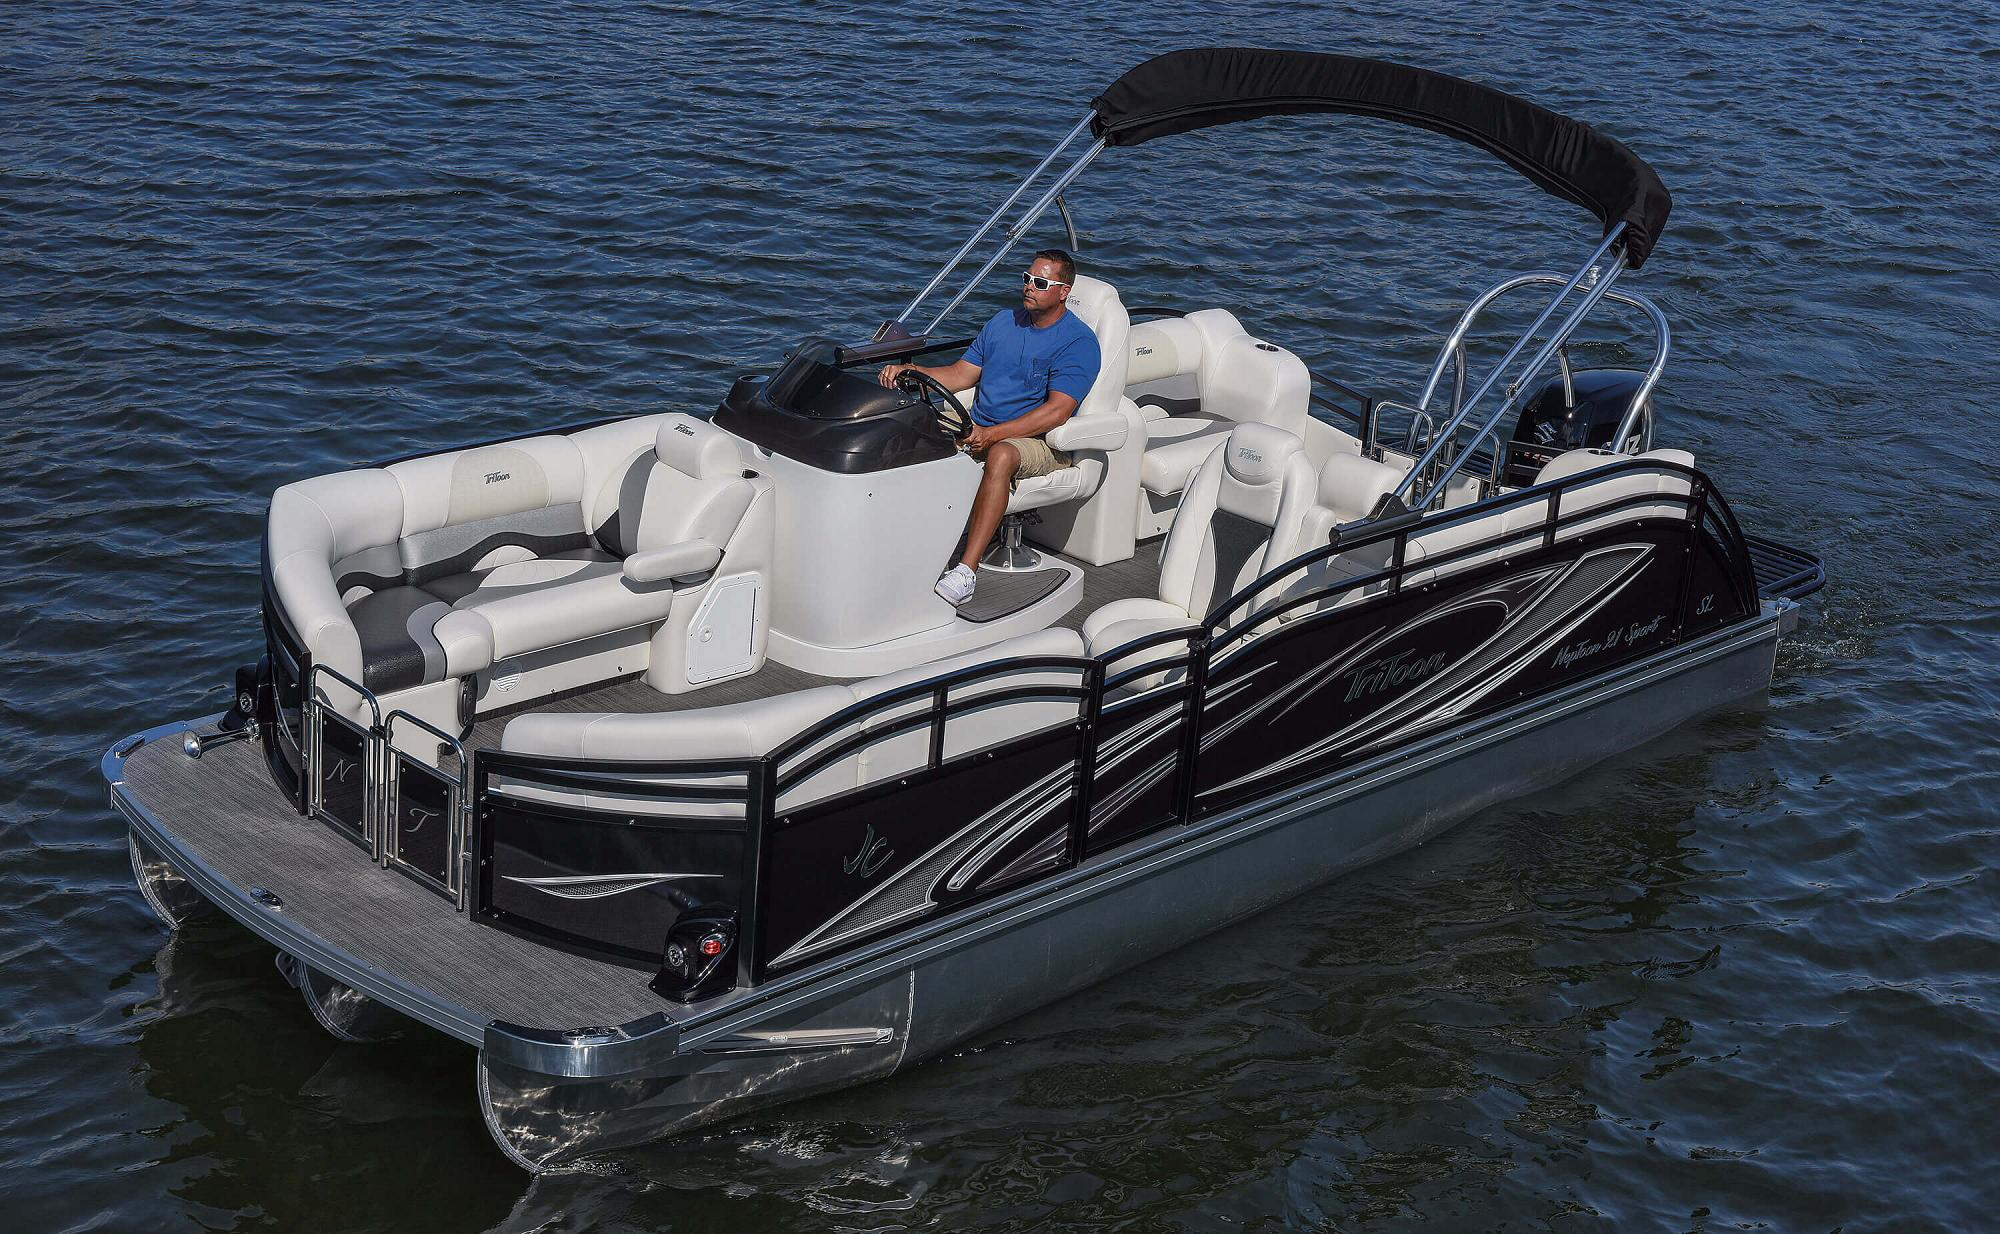 Neptoon Pontoon Boats Jc Tritoon Marine